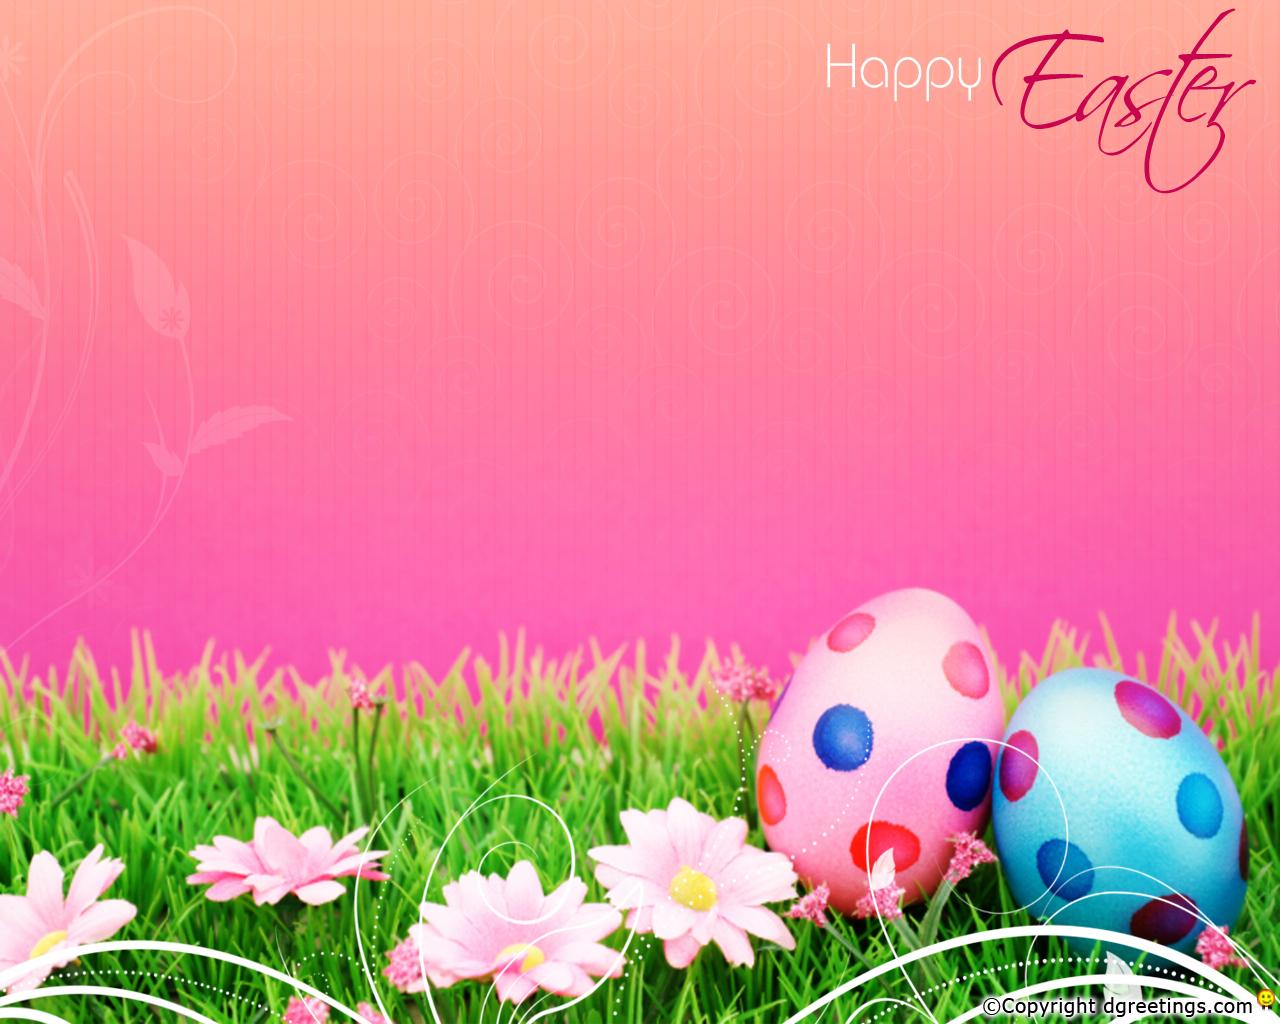 Pin Easter Wallpaper 1280x1024